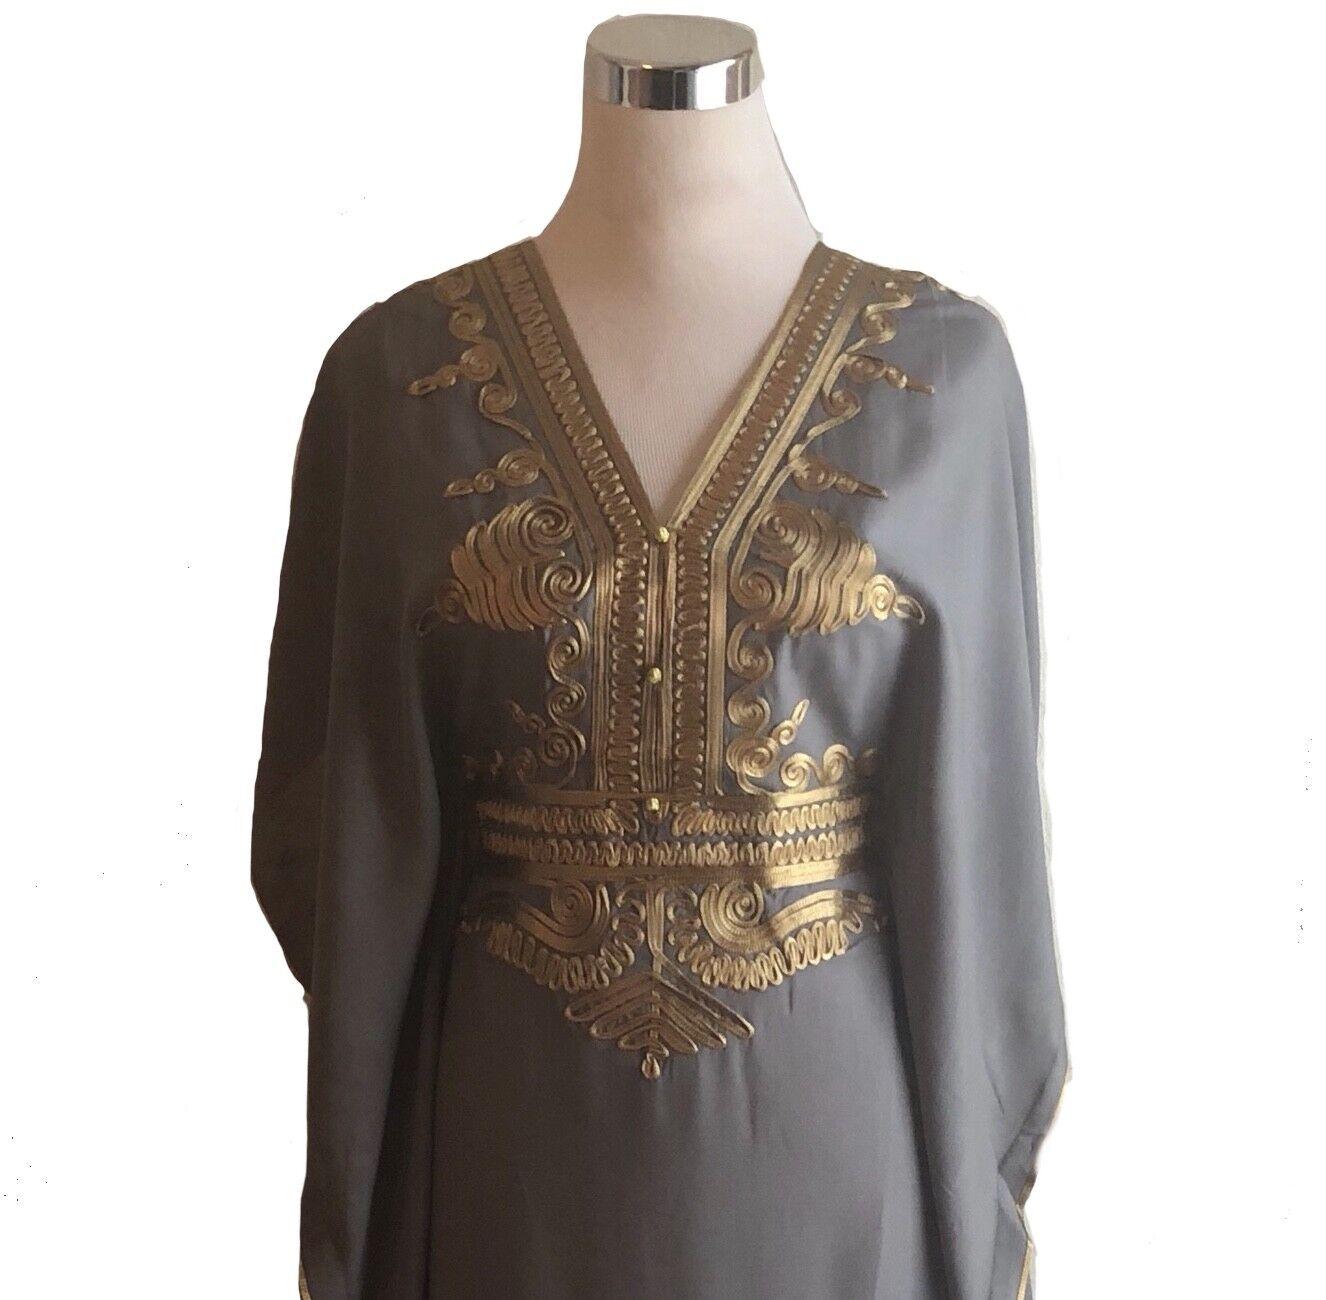 SALE !!! Moroccan kaftan Embroidery Batwing Maxi Dress Dubai Sexy Abaya one  size dcc1ea54434